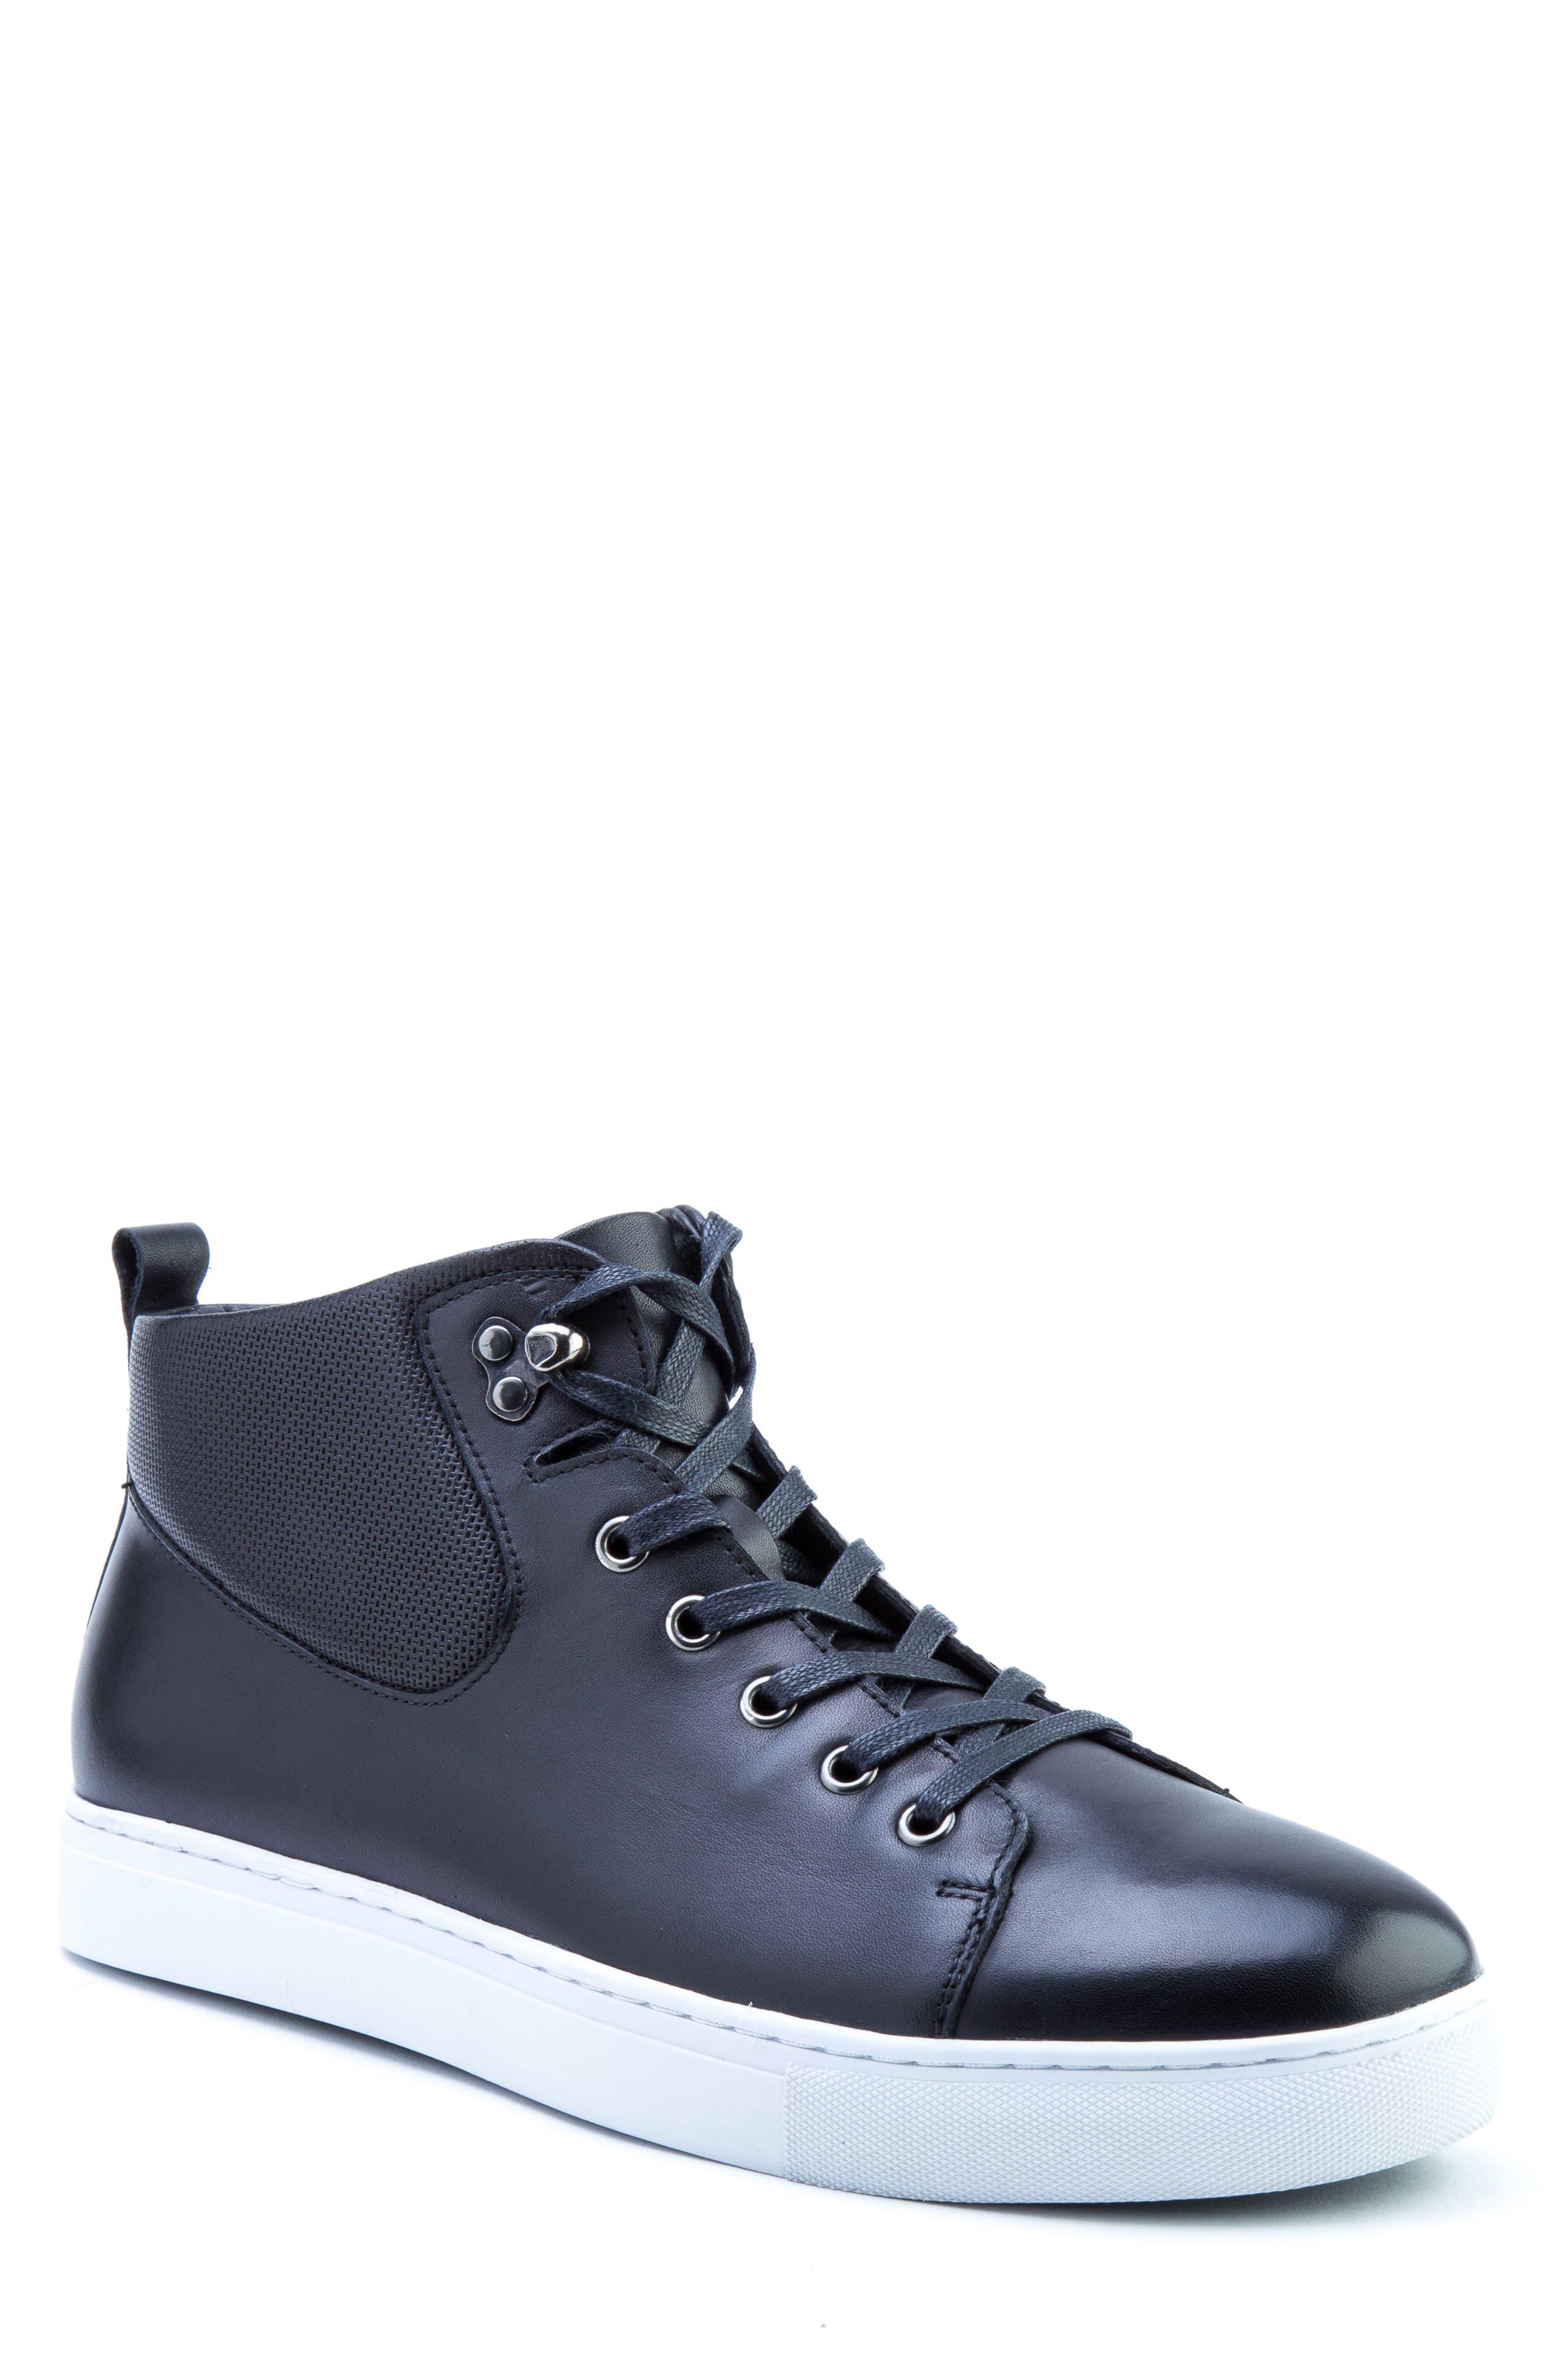 Sanders Sneaker,                         Main,                         color, BLACK LEATHER